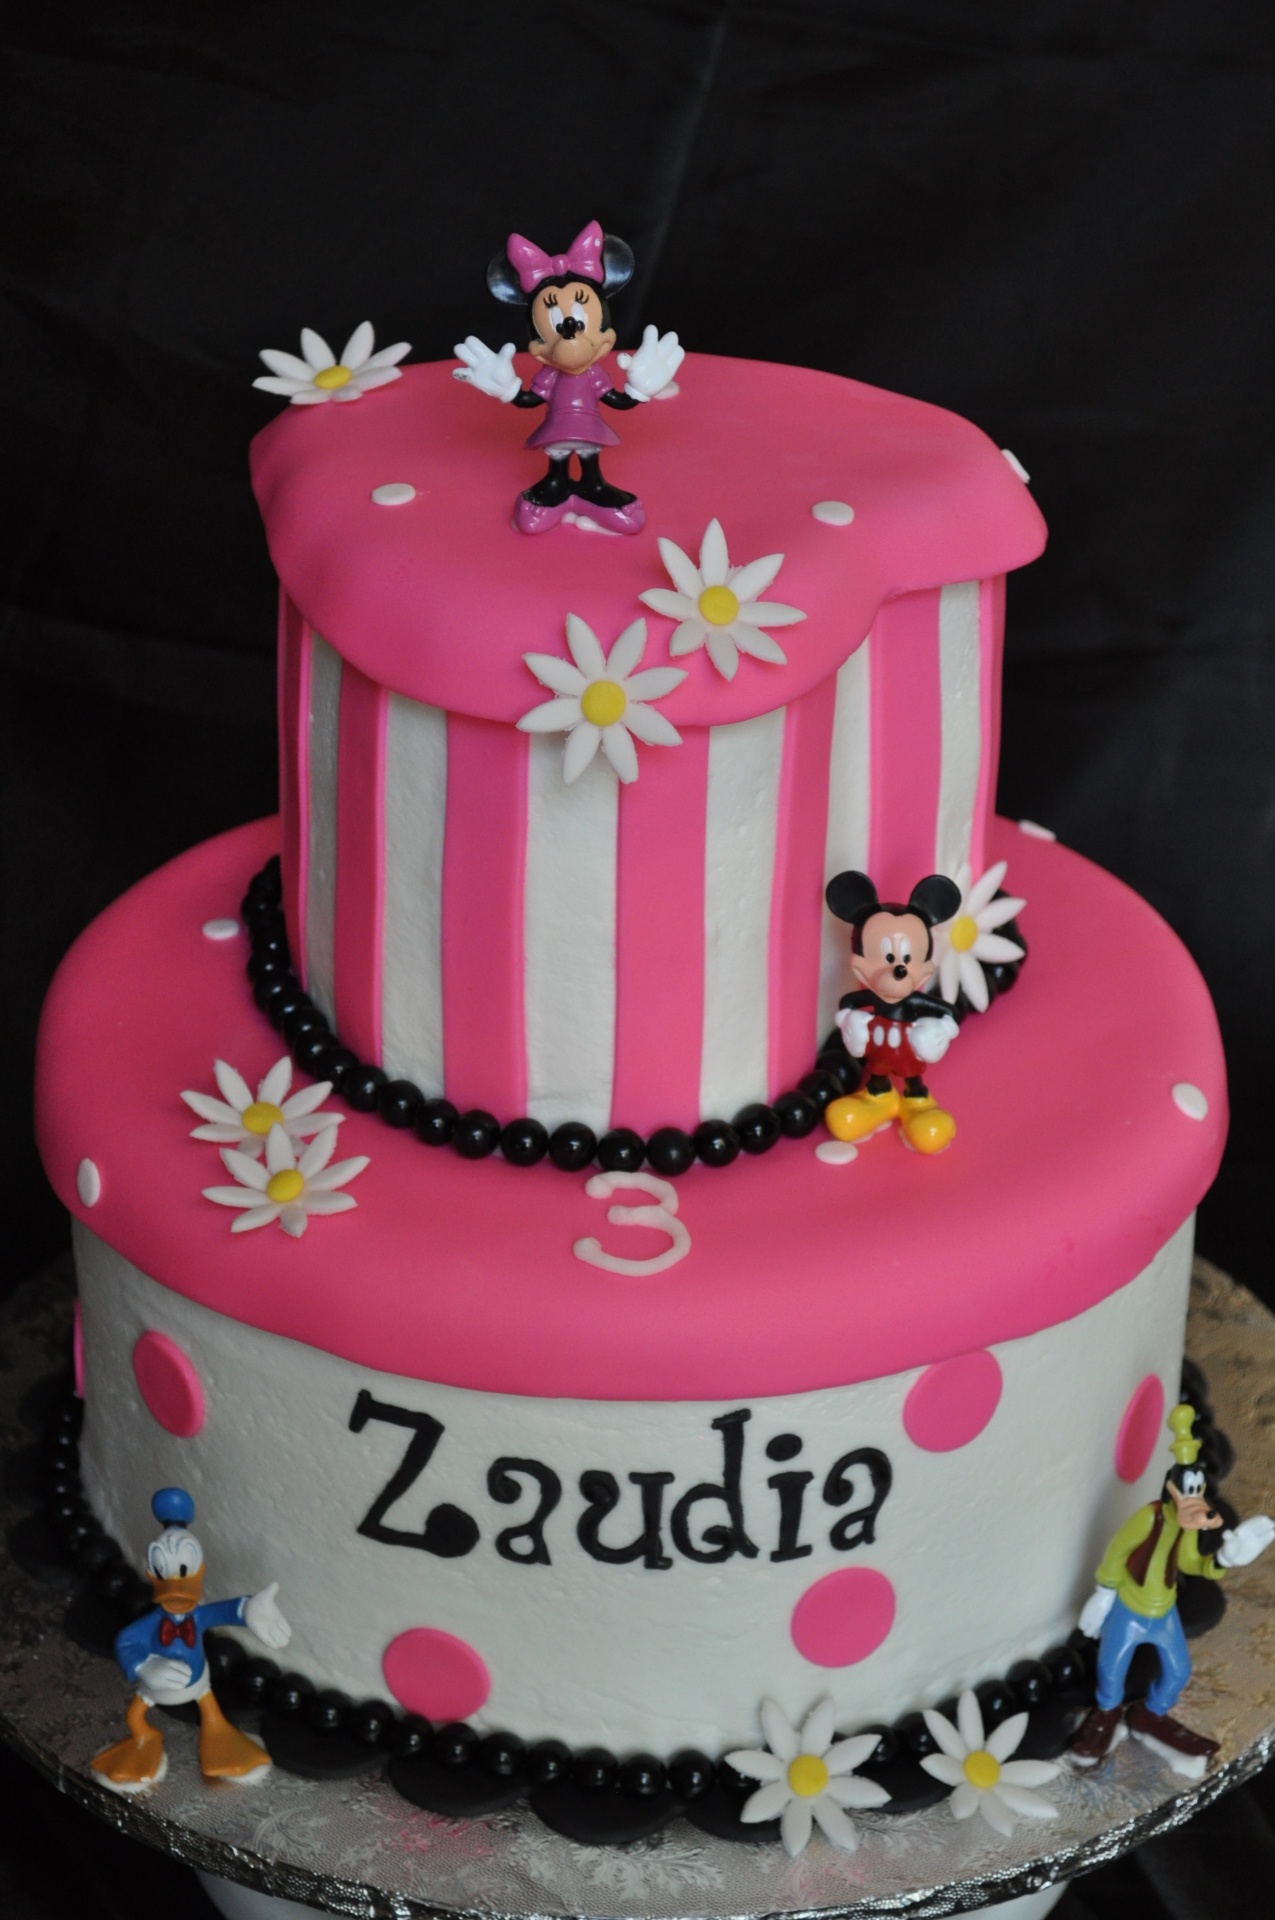 Minnie mouse cake, heart fondant cake